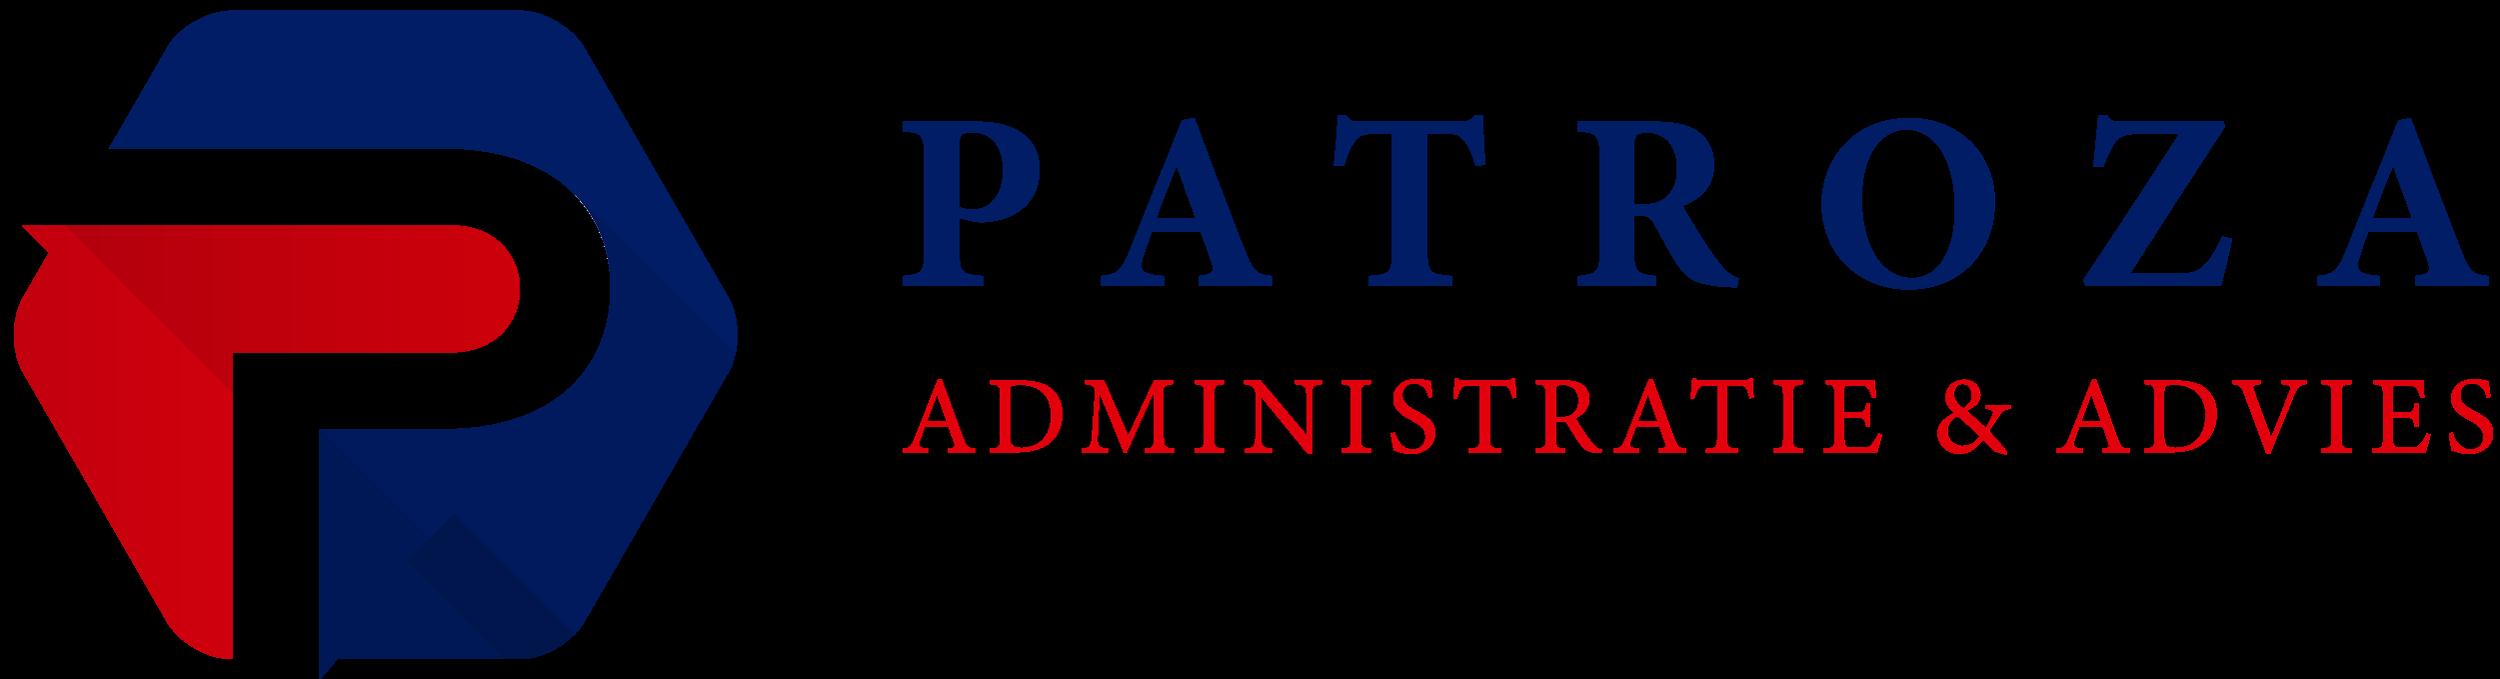 Patroza | Administratie & Advies